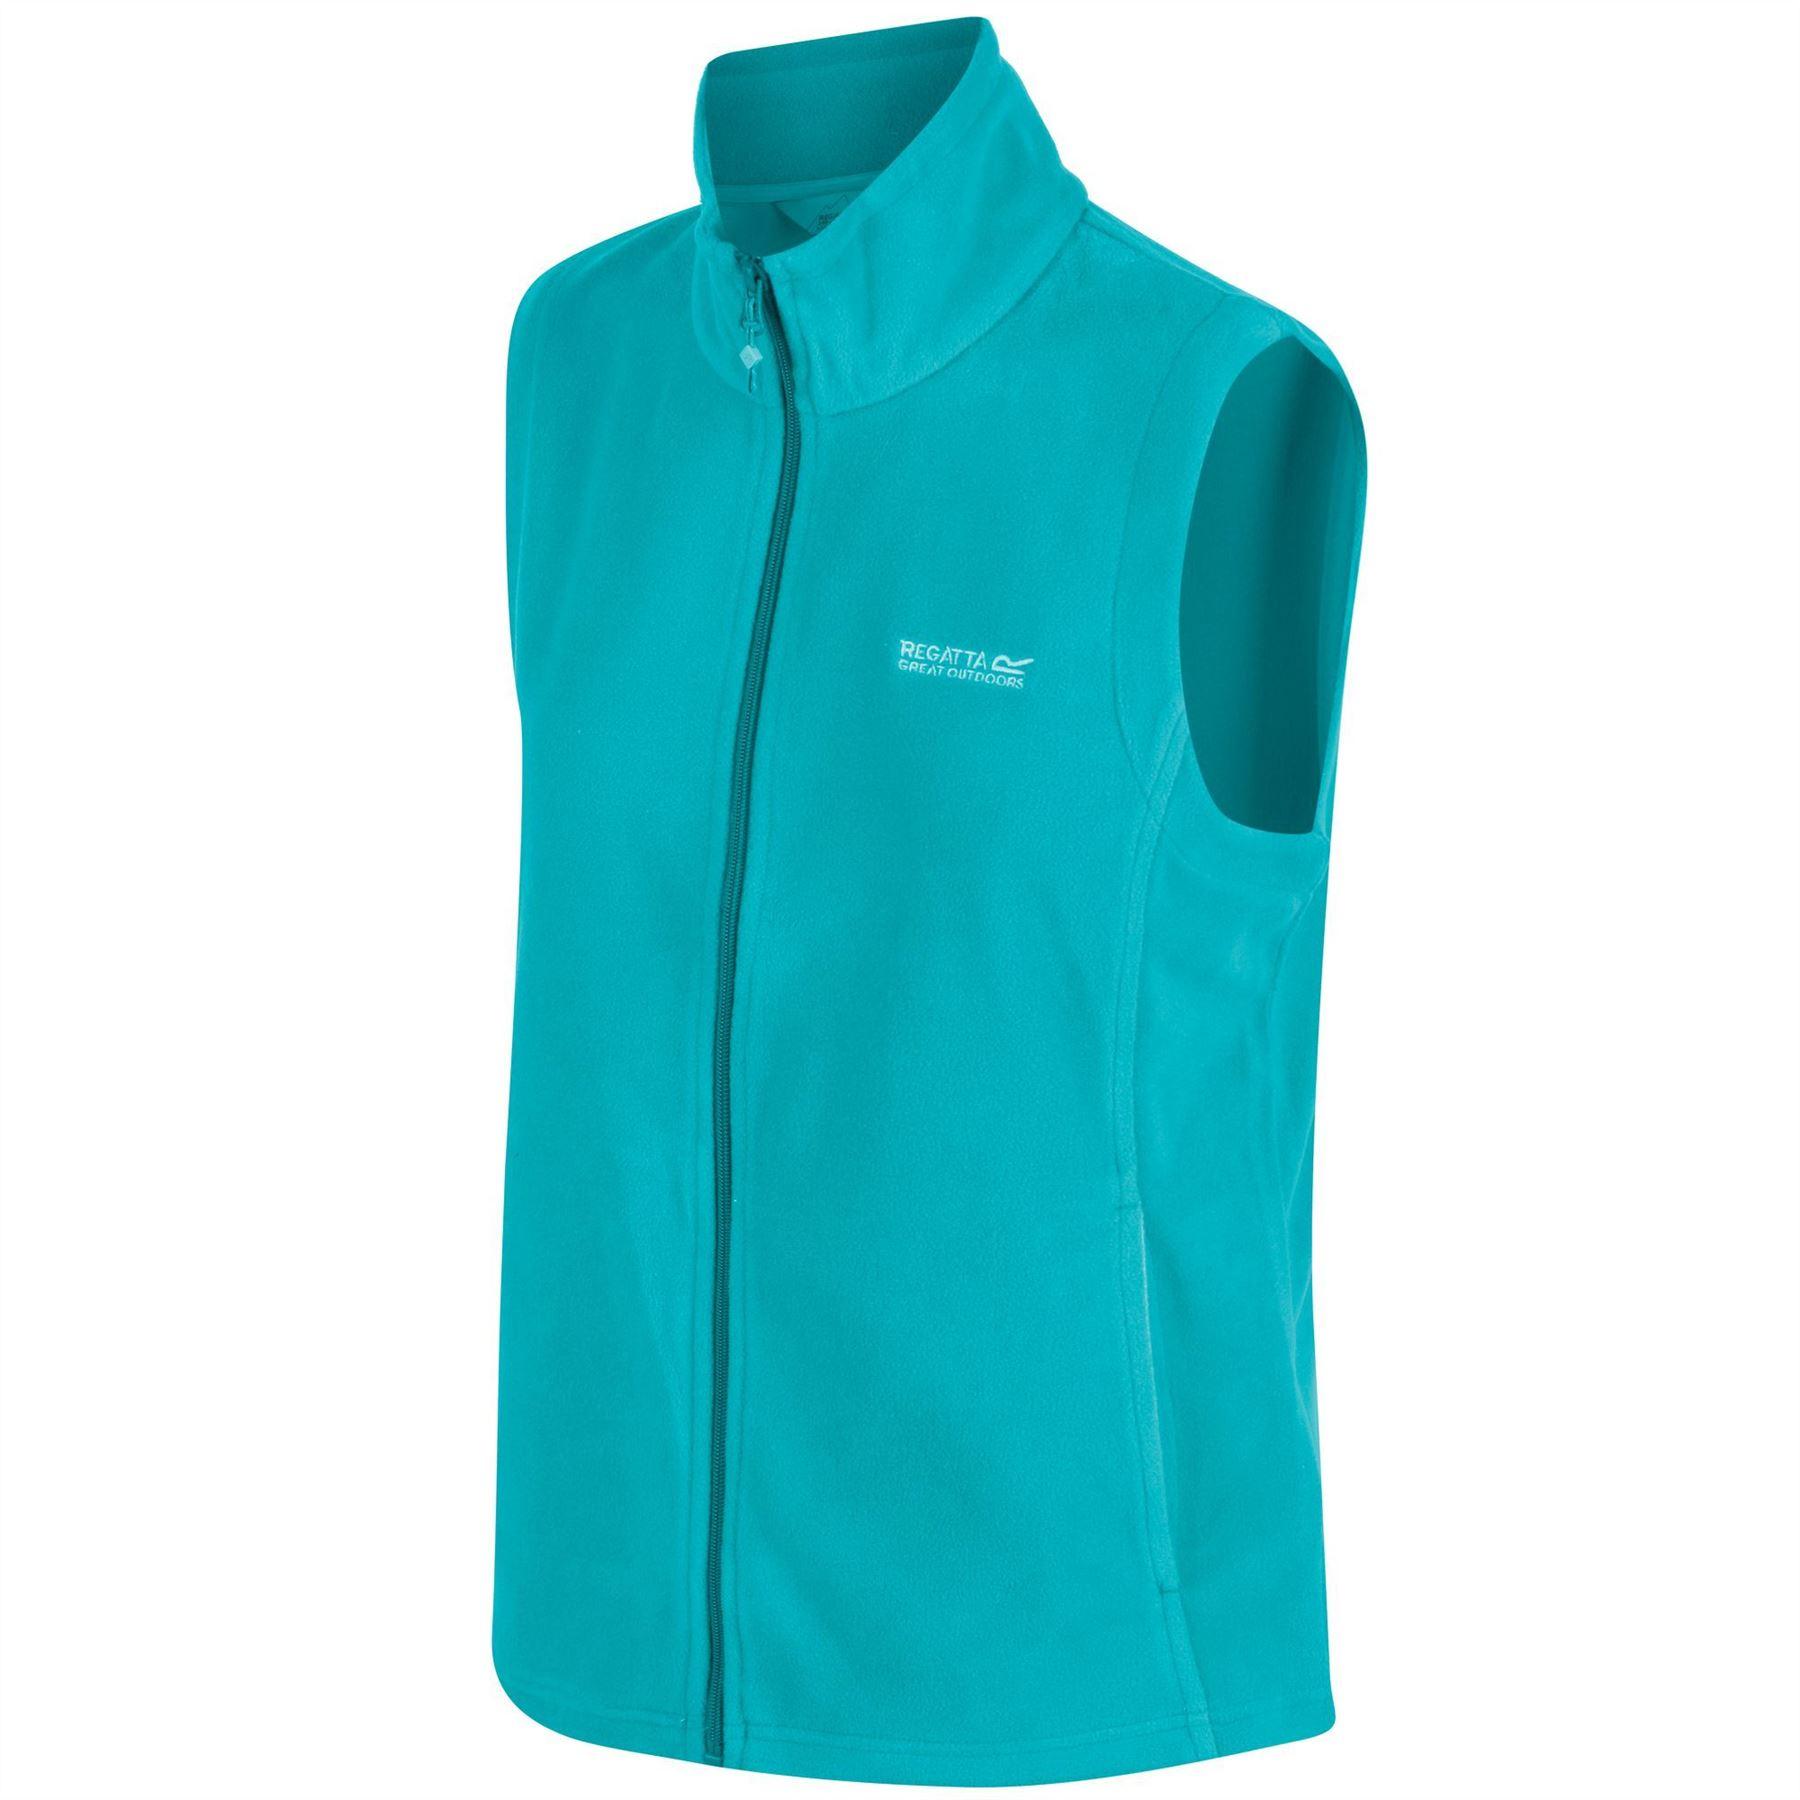 miniatuur 19 - Regatta Womens Sweetness Full Zip Micro Fleece Casual Bodywarmer Waistcoat